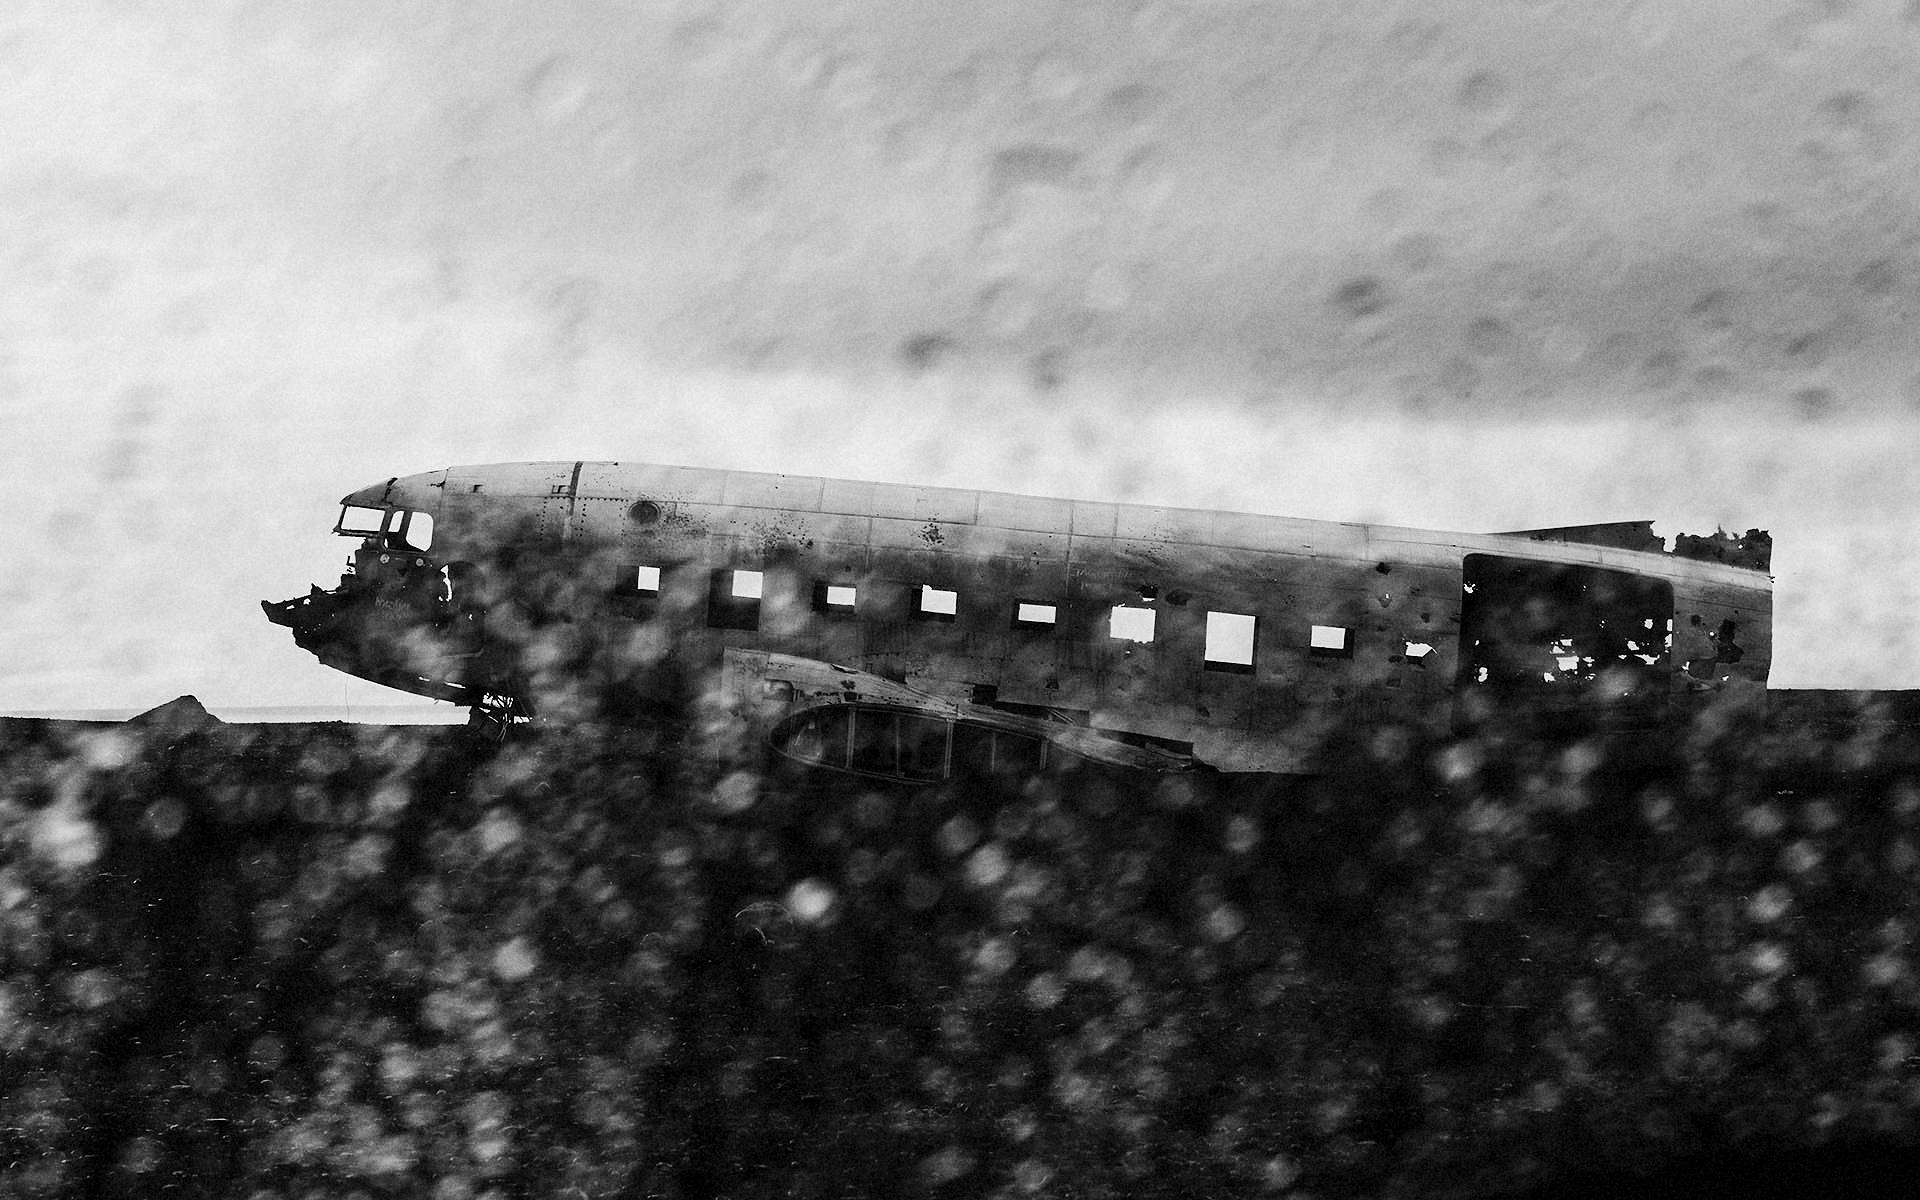 Bud-johnson-iceland-photos0009.jpg